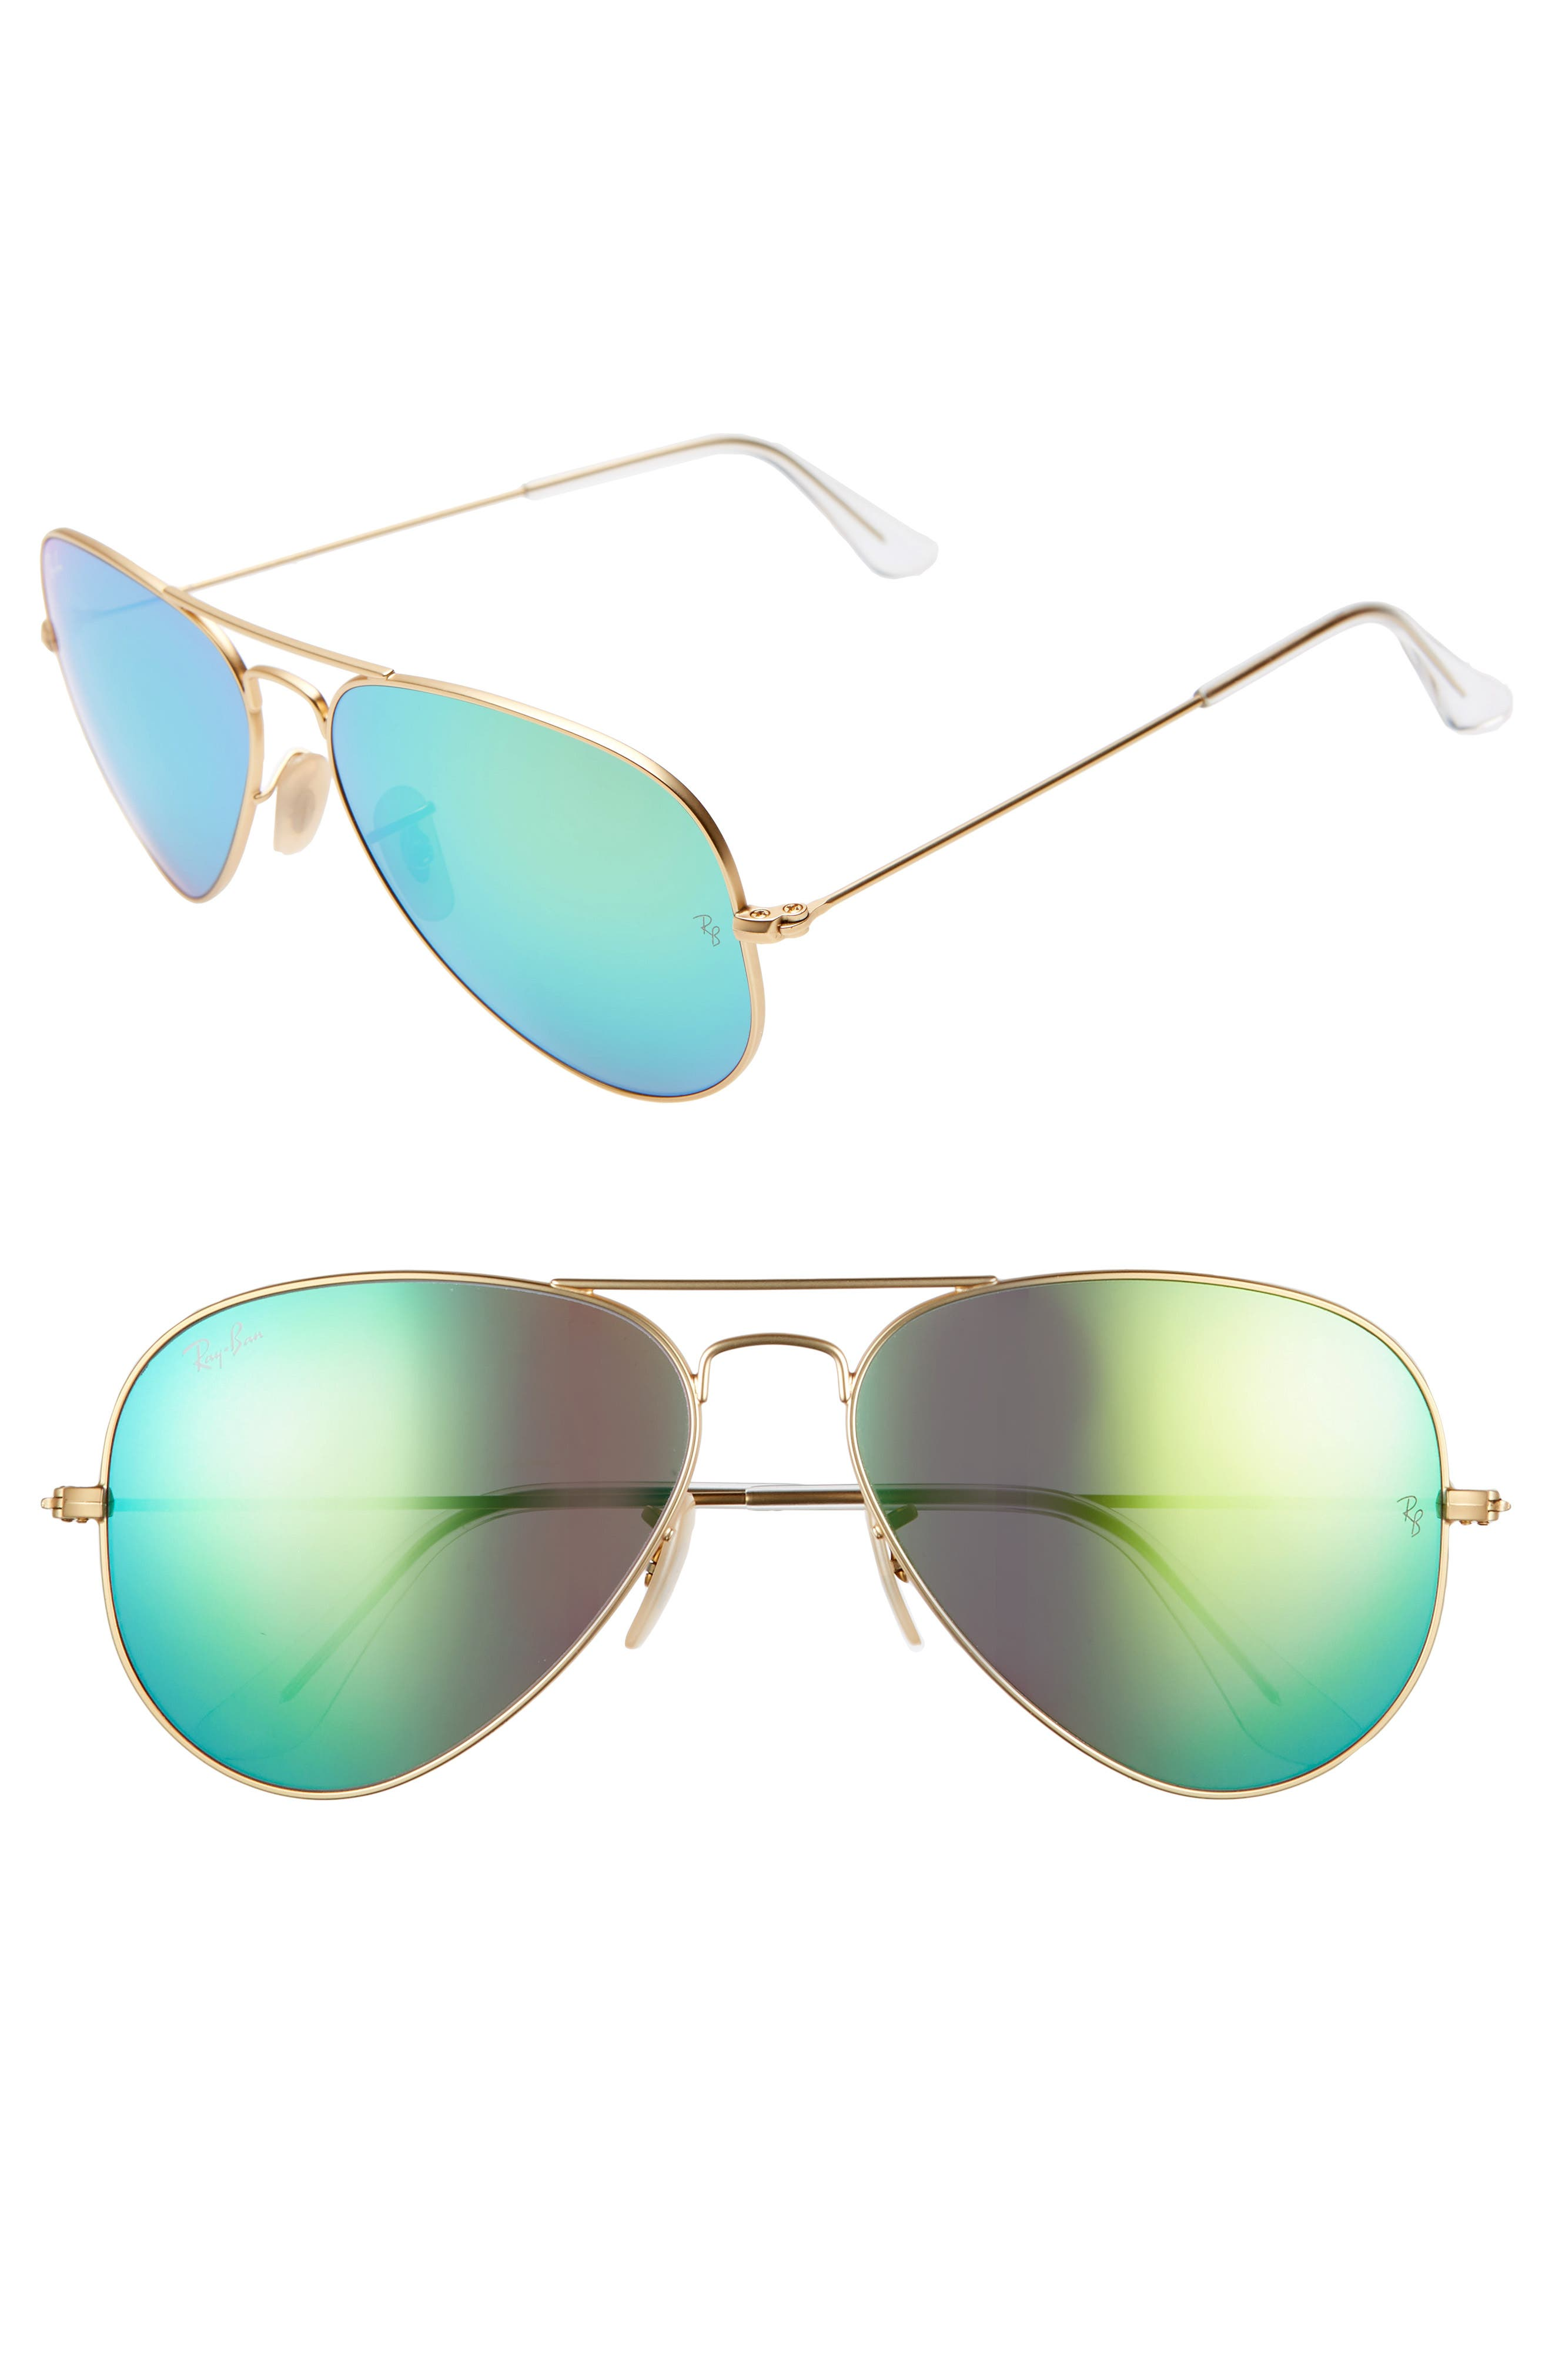 RAY-BAN, 58mm Mirrored Aviator Sunglasses, Main thumbnail 1, color, GOLD/ GREEN FLASH MIRROR